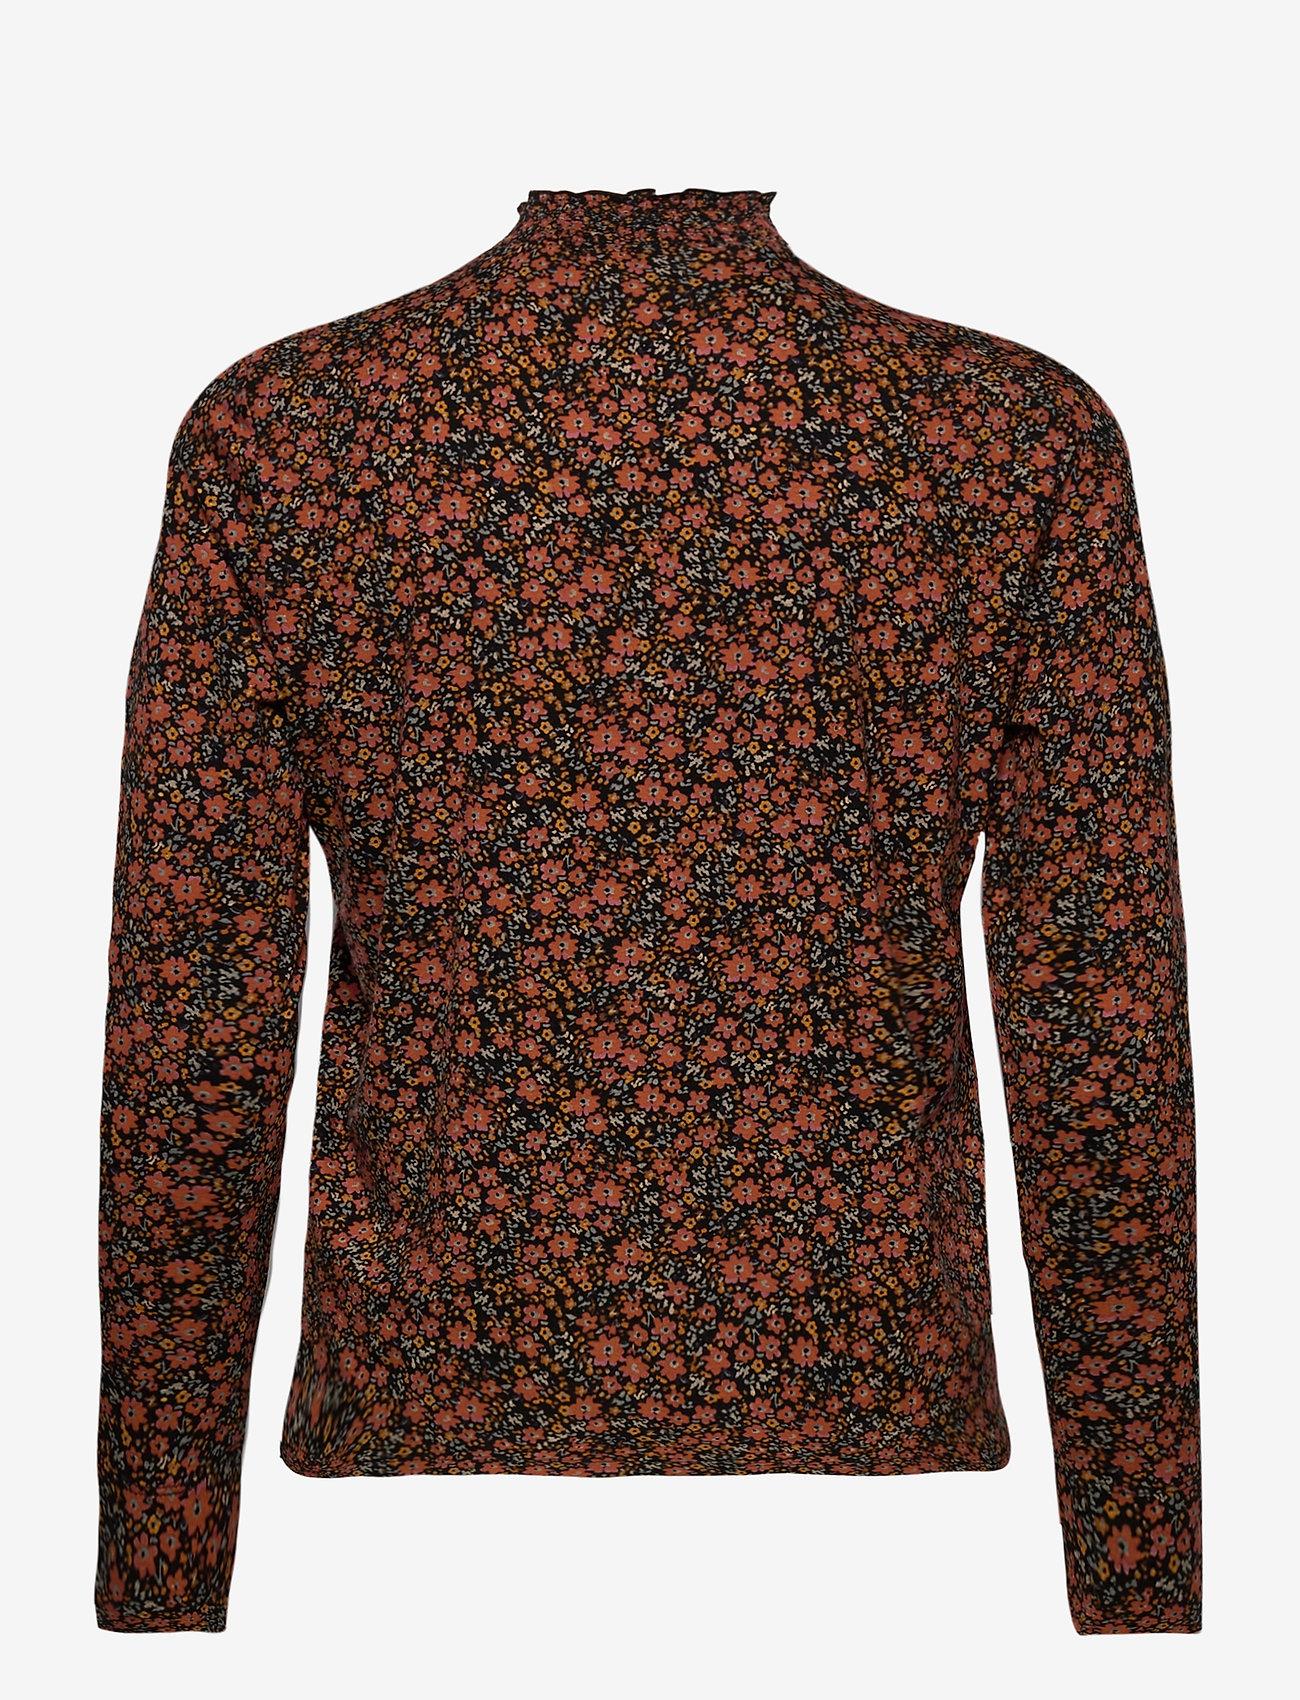 Avacr Ls T-shirt   - Cream -  Women's T-shirts & Tops Buy Newest